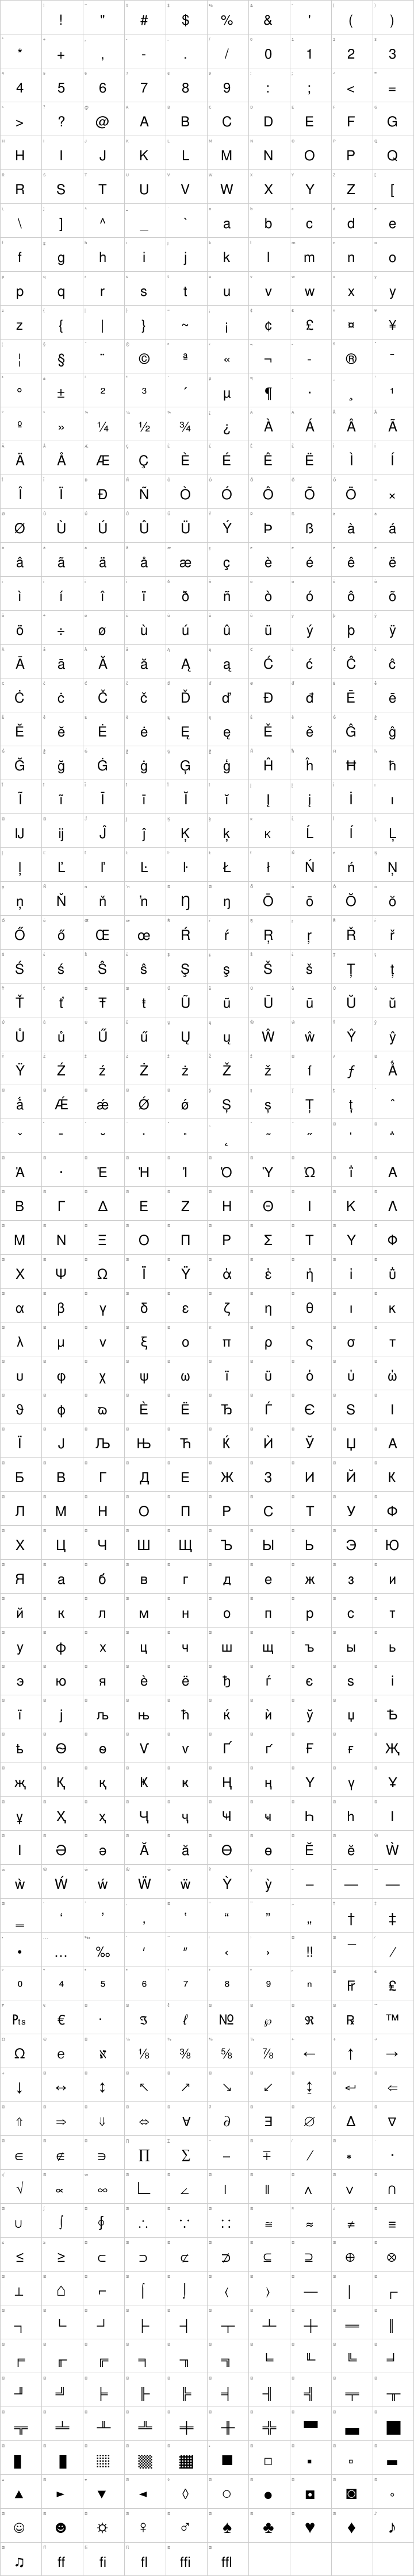 Nimbus Sans L Font Free by URW++ » Font Squirrel